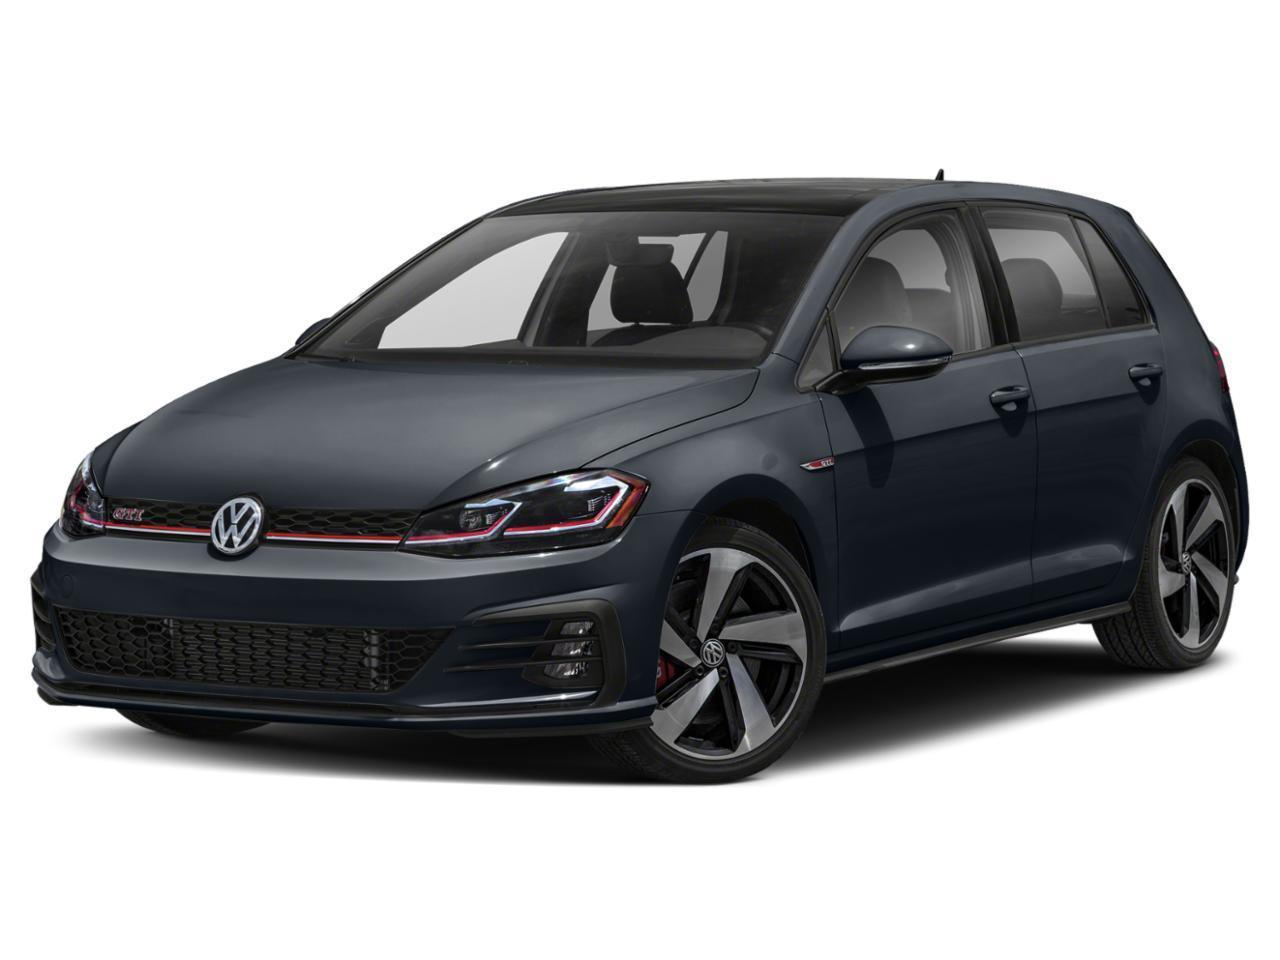 2021 Volkswagen Golf GTI Vehicle Photo in Union City, GA 30291